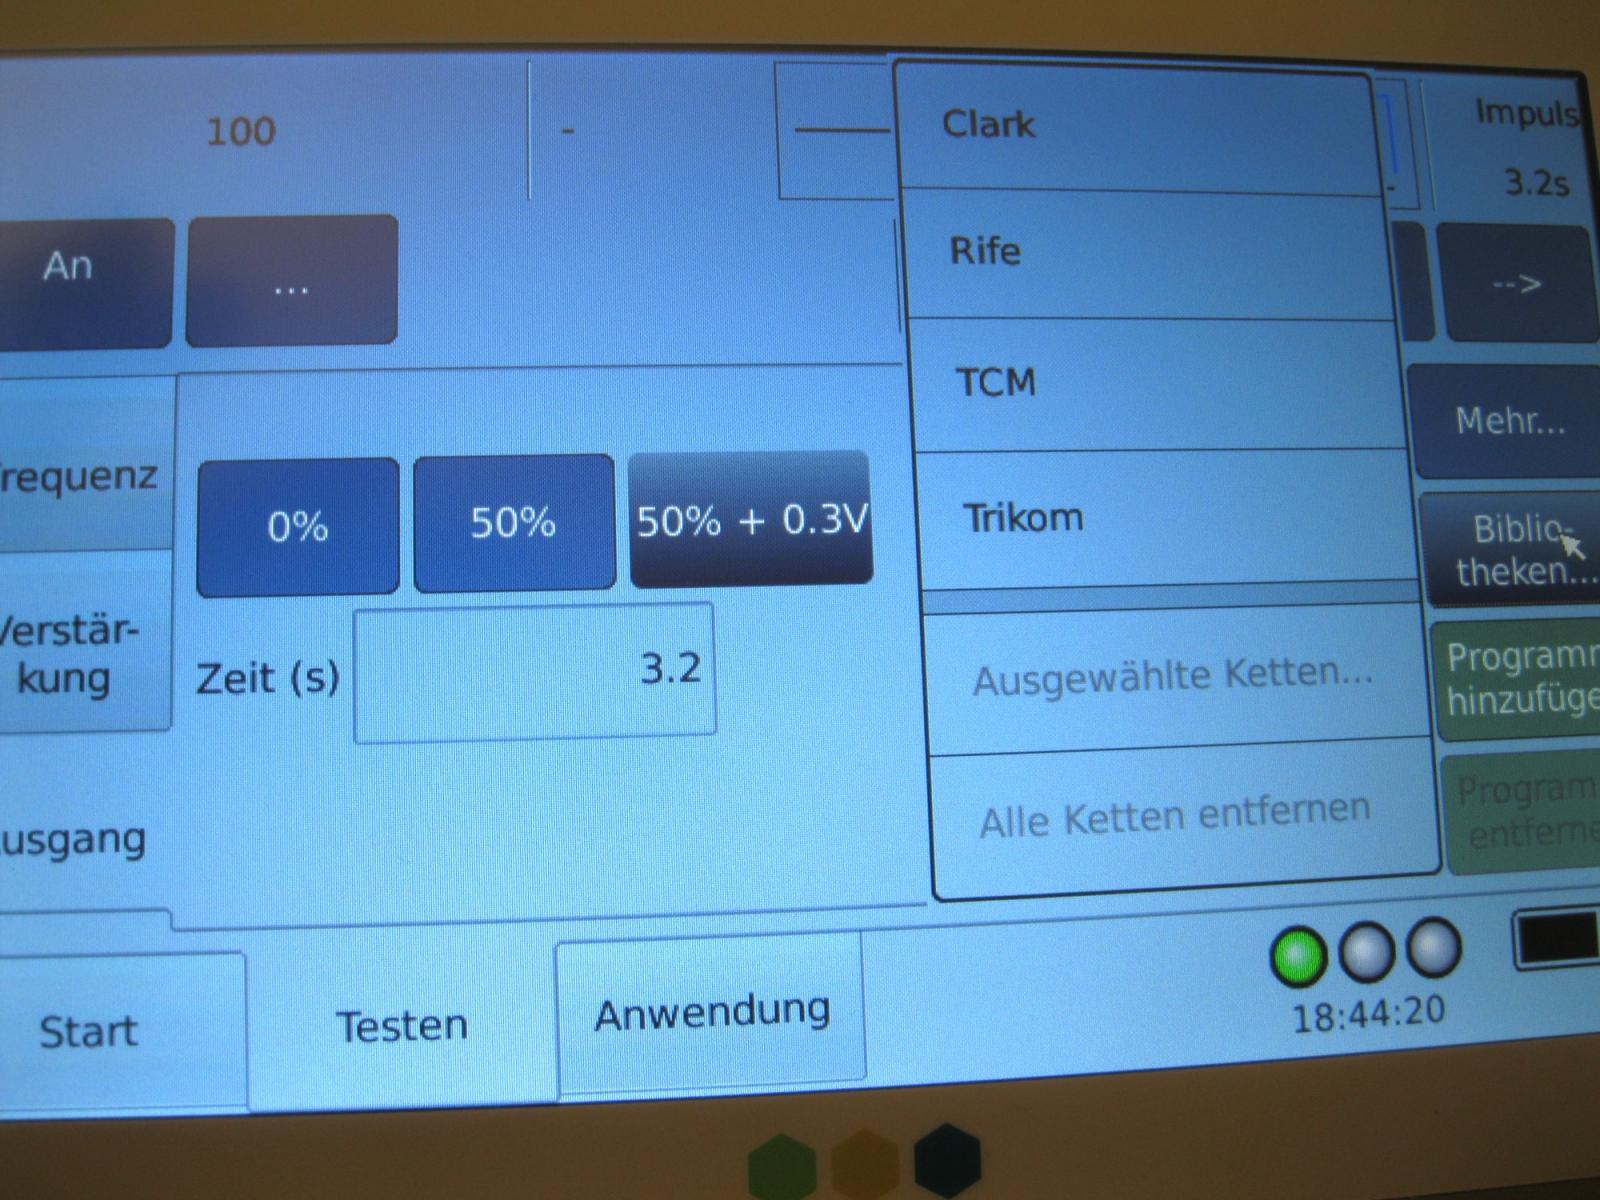 Trikombin-Clark-Frequenzen-Menü-Touchscreeen